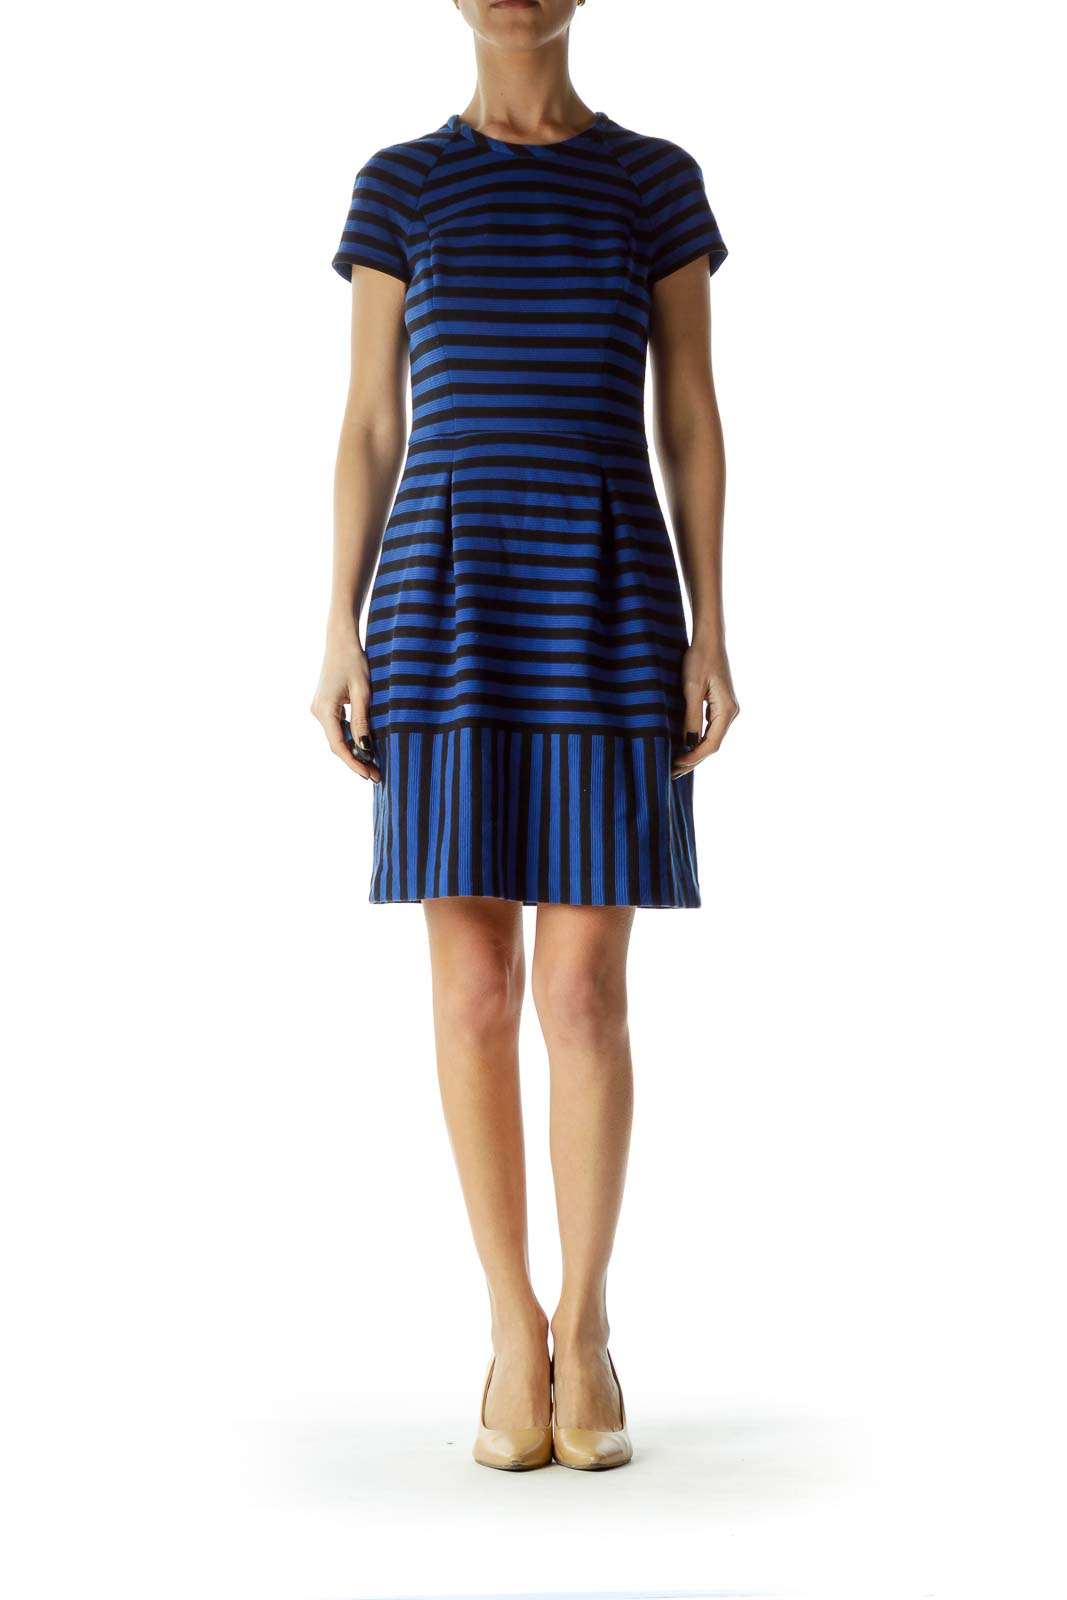 Blue Black Striped Textured A-Line Dress